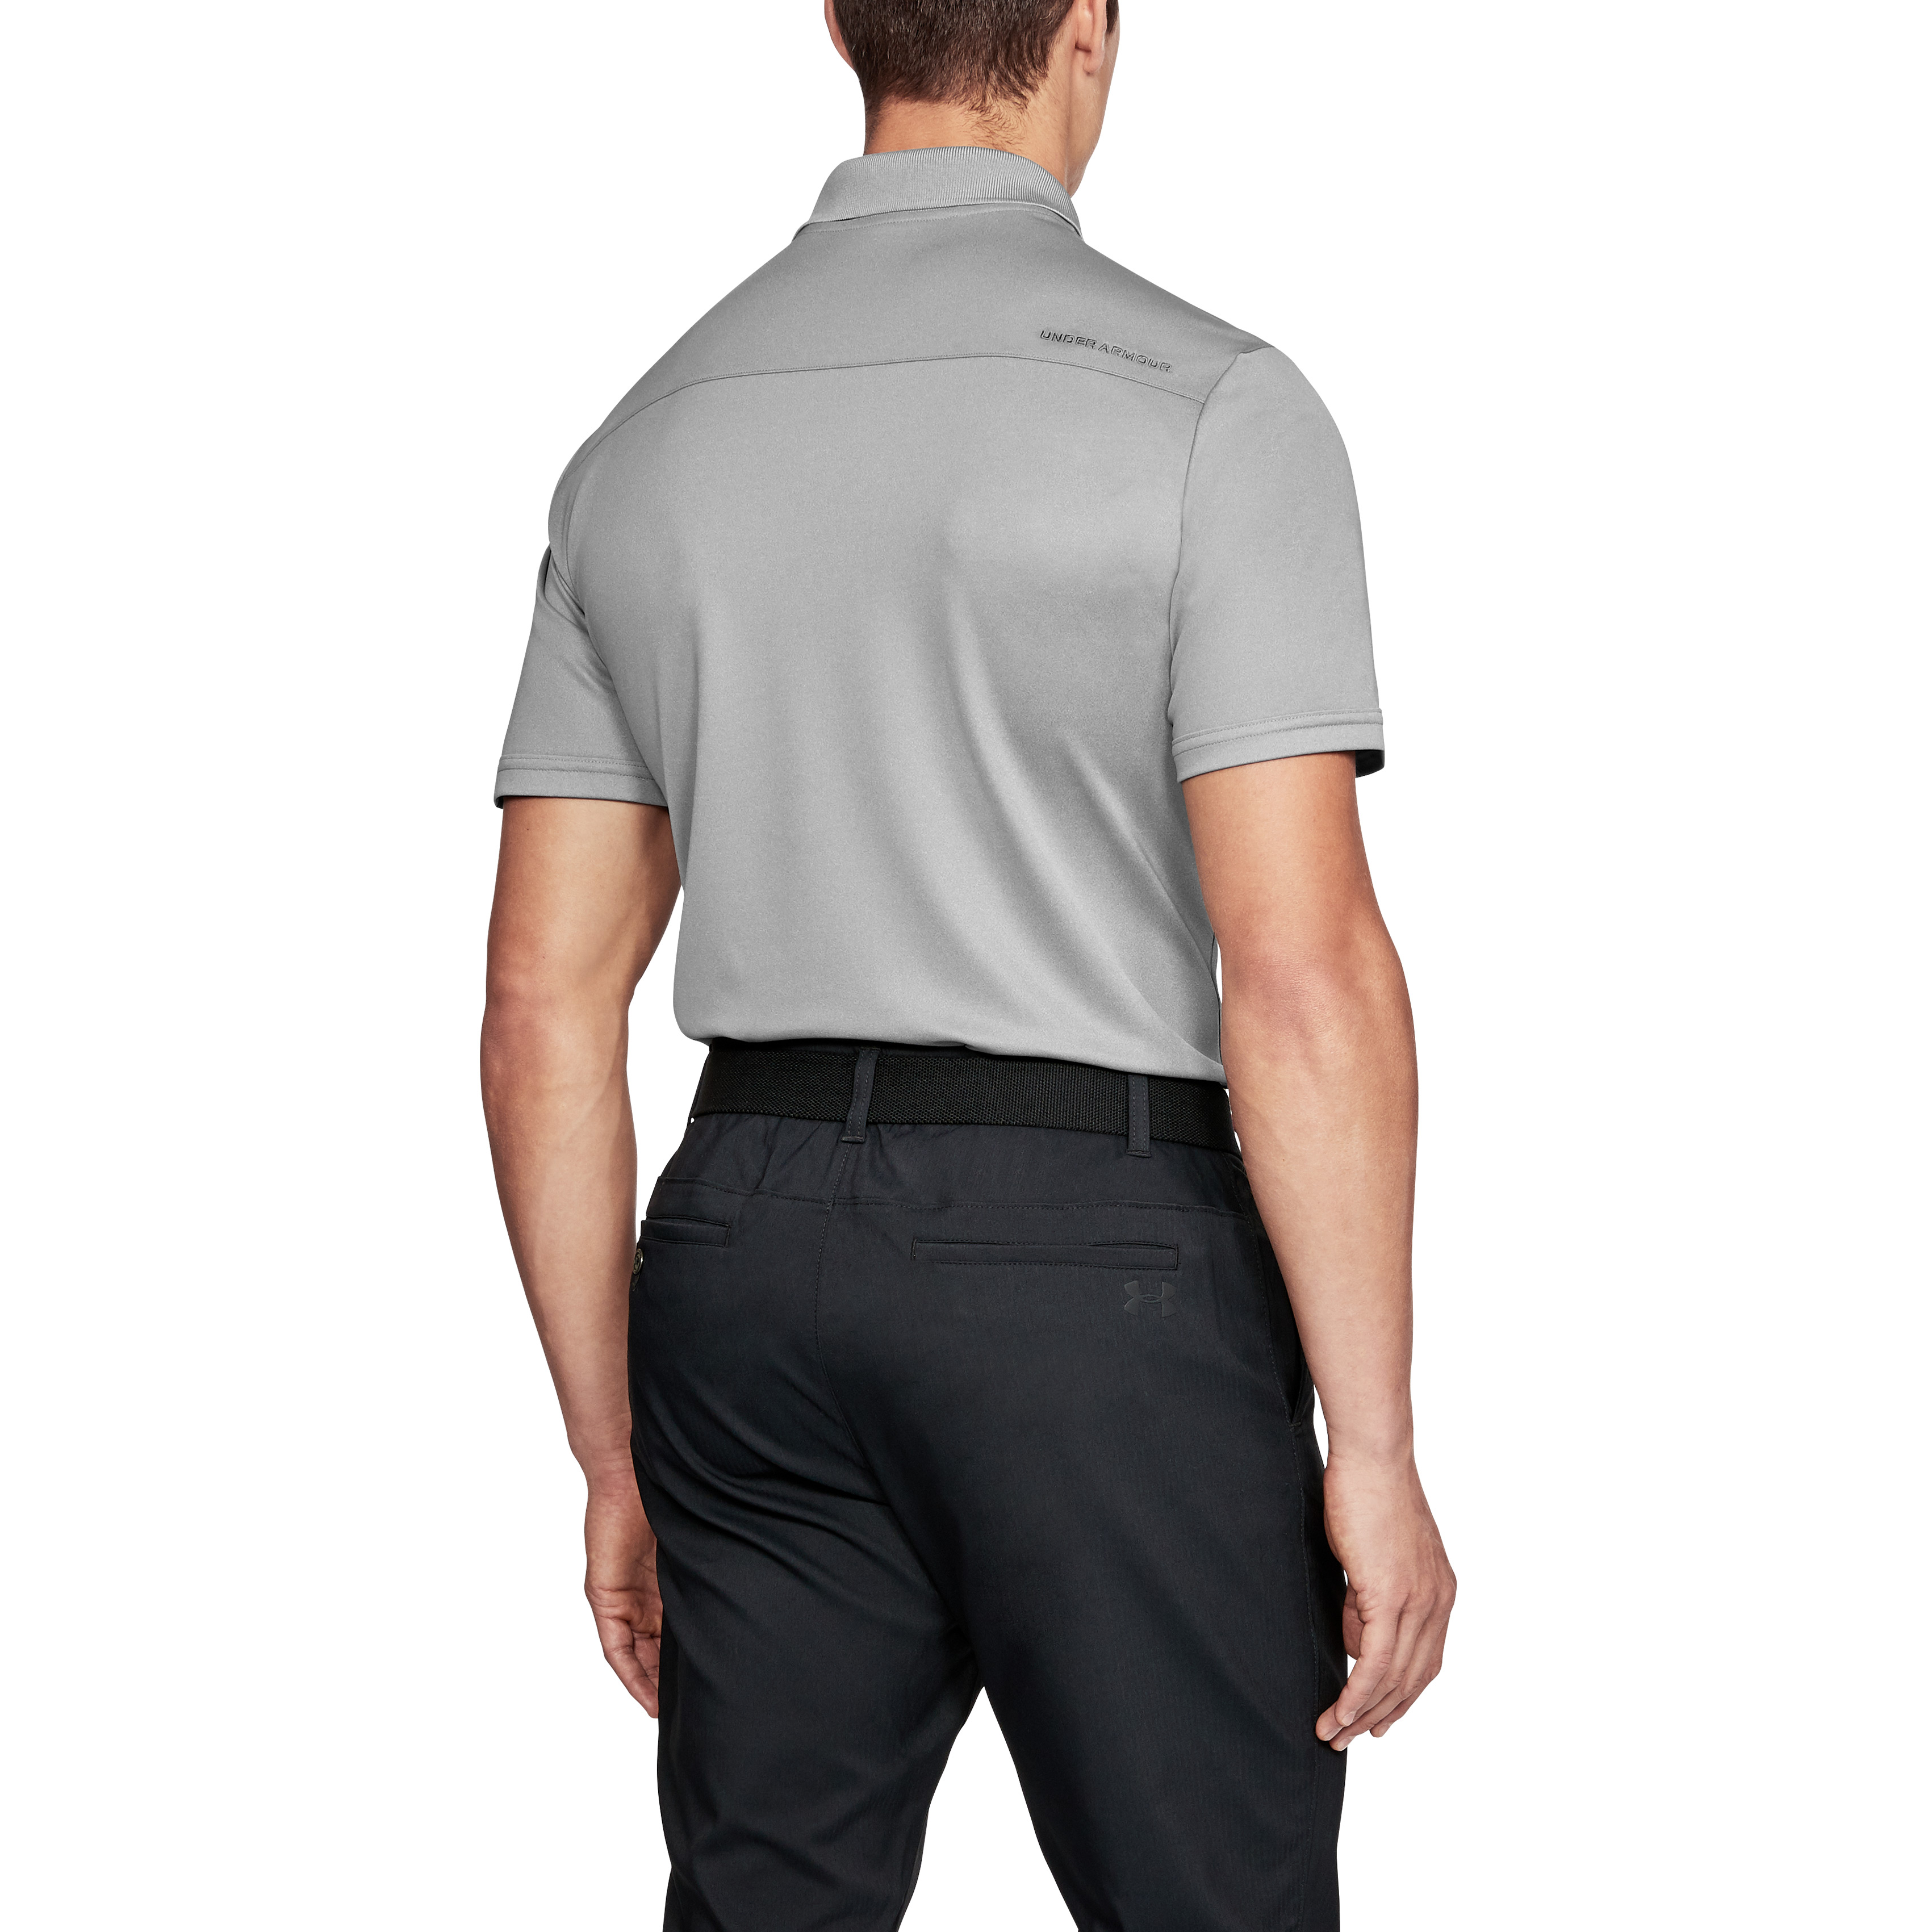 Under-Armour-Mens-Medal-Play-Performance-Polo-Shirt-UA-Golf-Short-Sleeve thumbnail 24